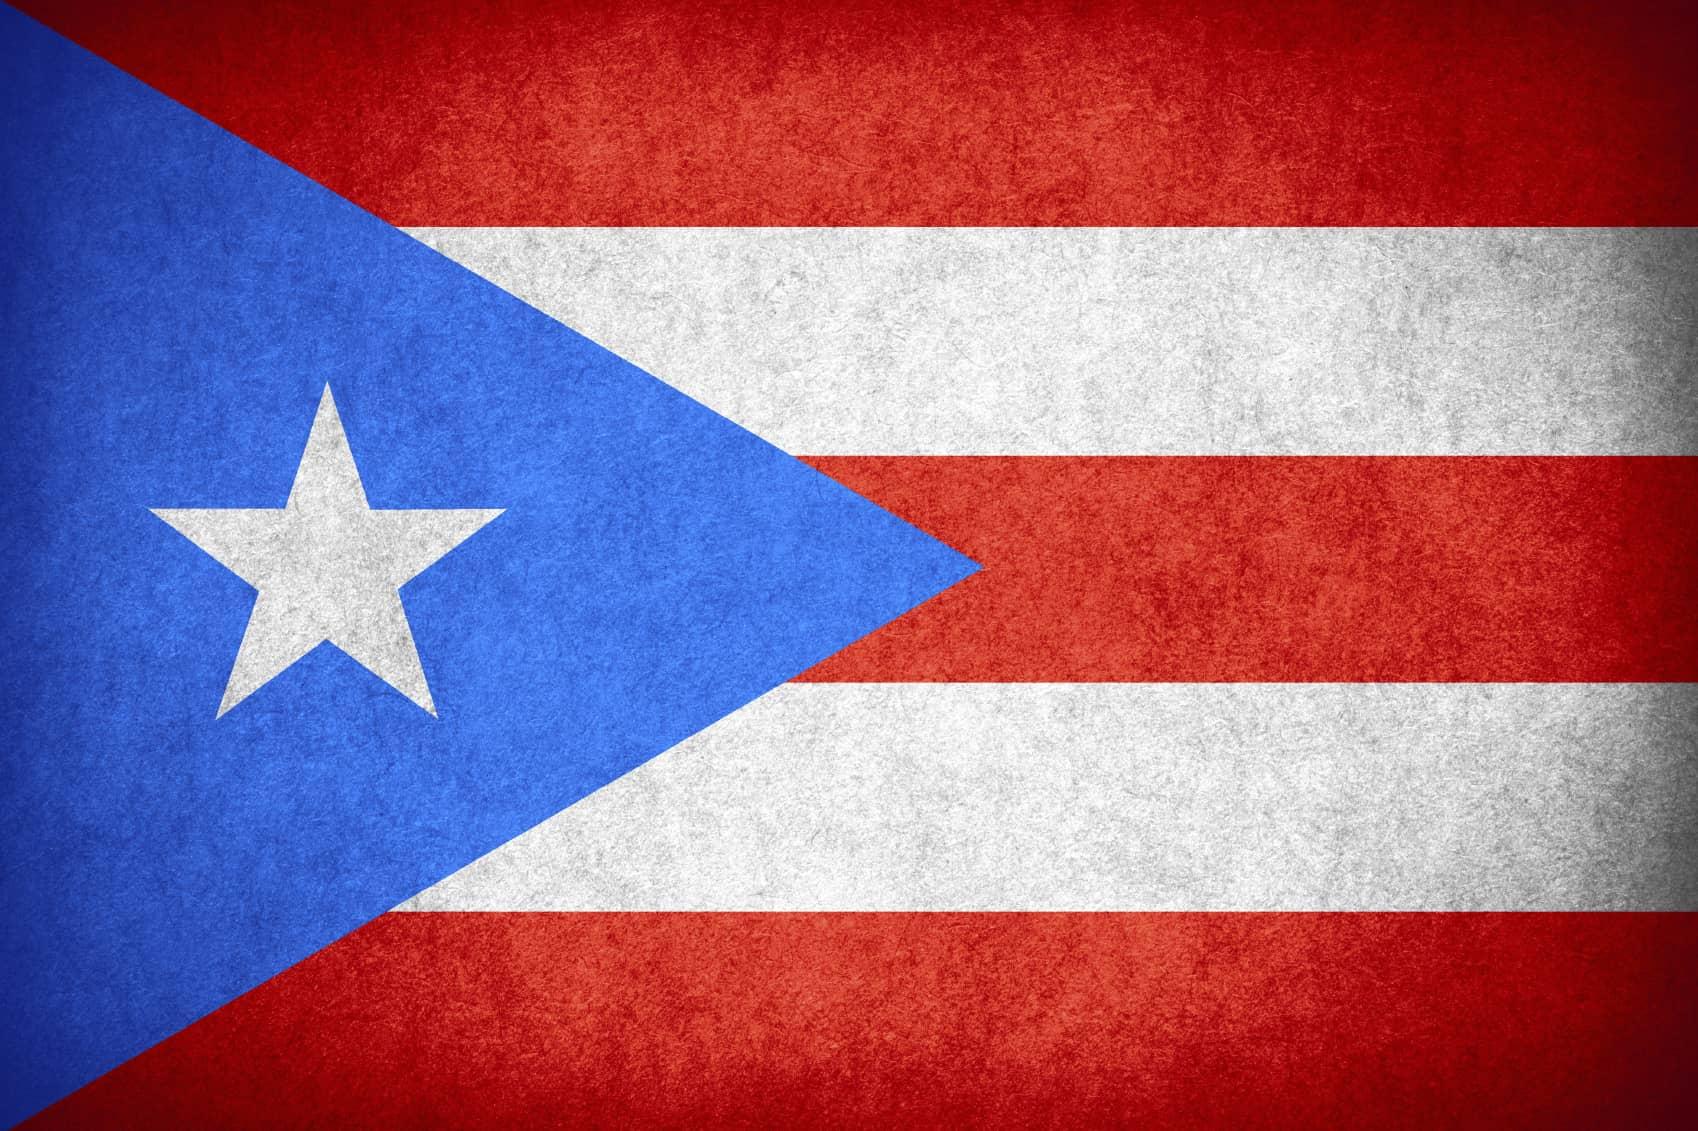 iStock_000033053128_Medium JinkoSolar Supplying Modules For 57.65 MW Puerto Rican Project